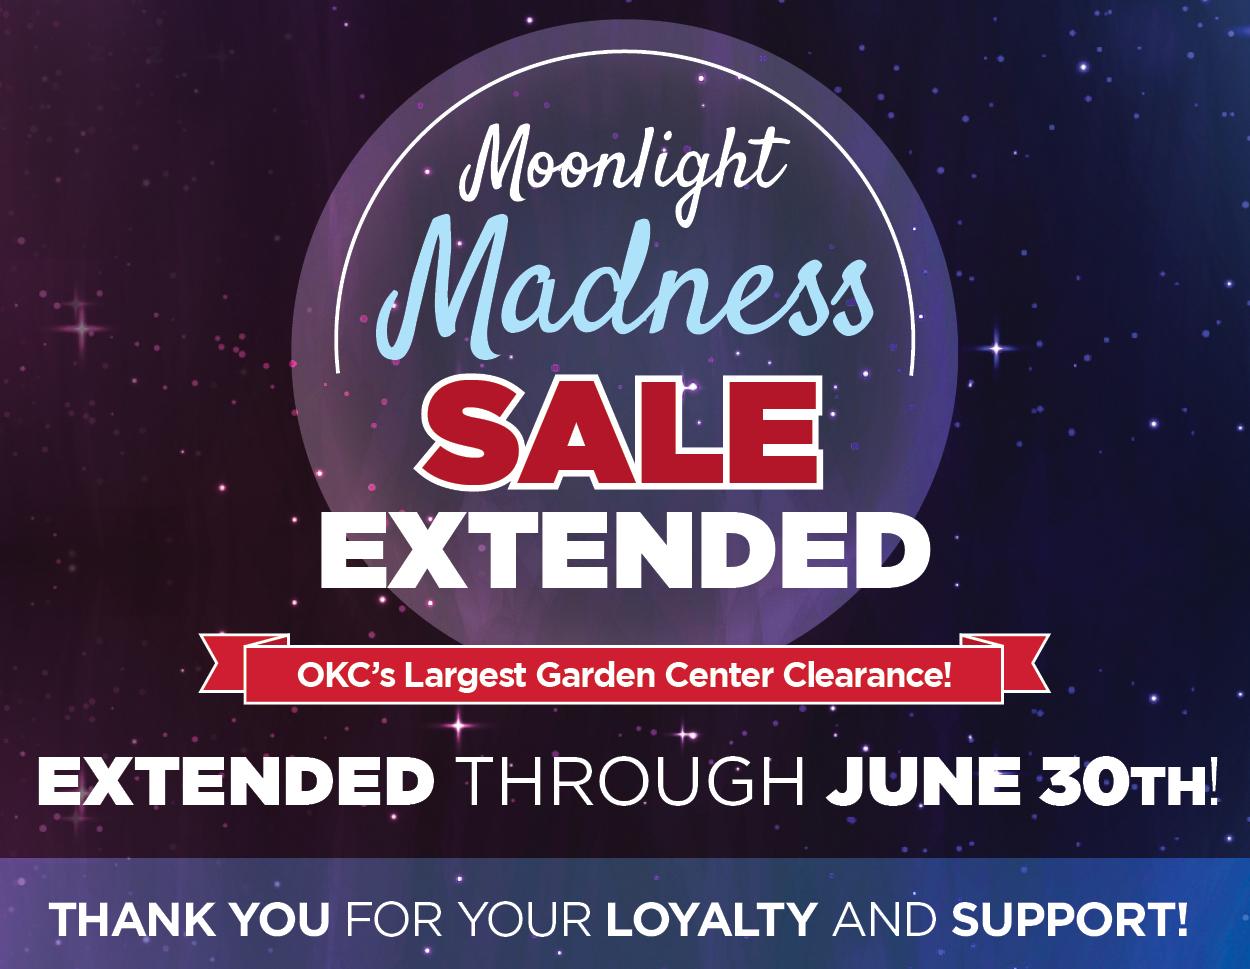 Moonlight Madness | TLC Garden Centers